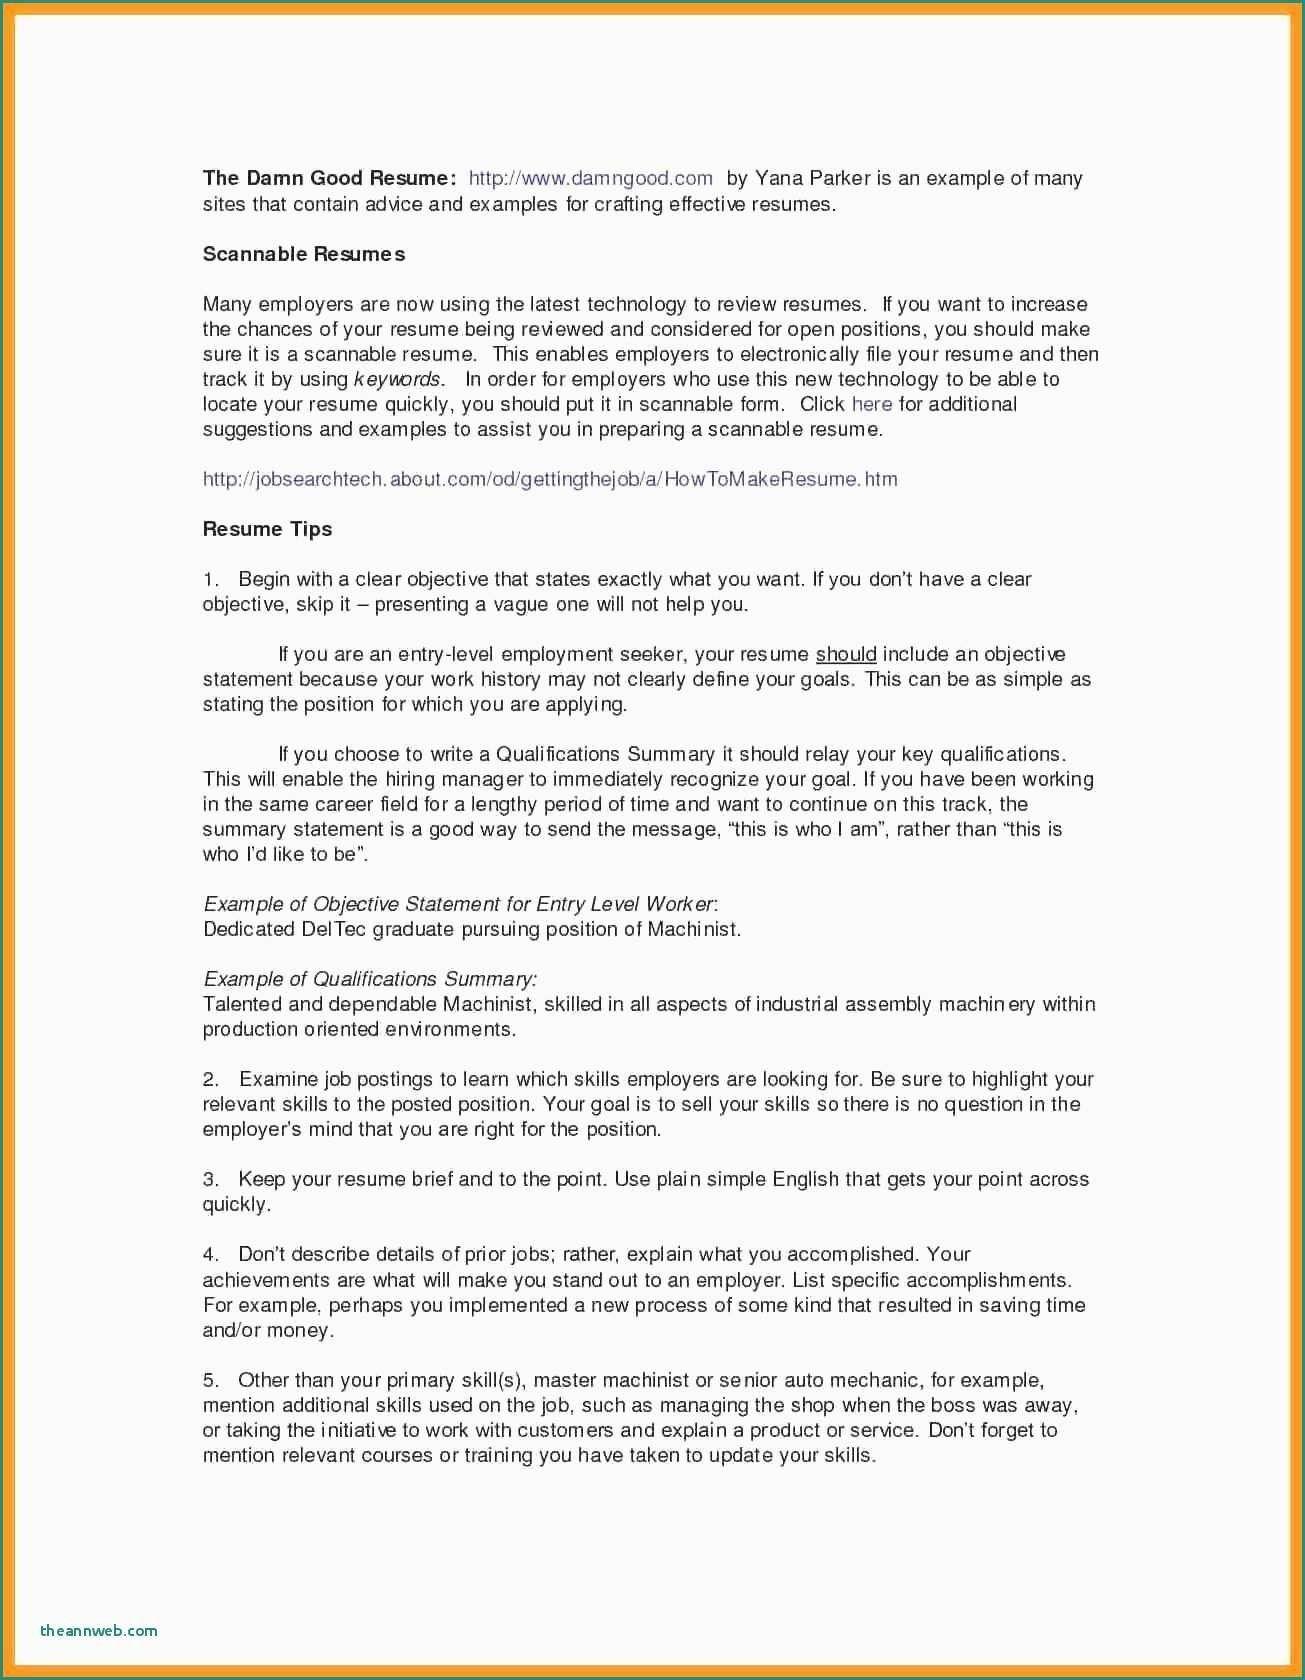 Readable Summarizing Worksheets 4th Grade Media